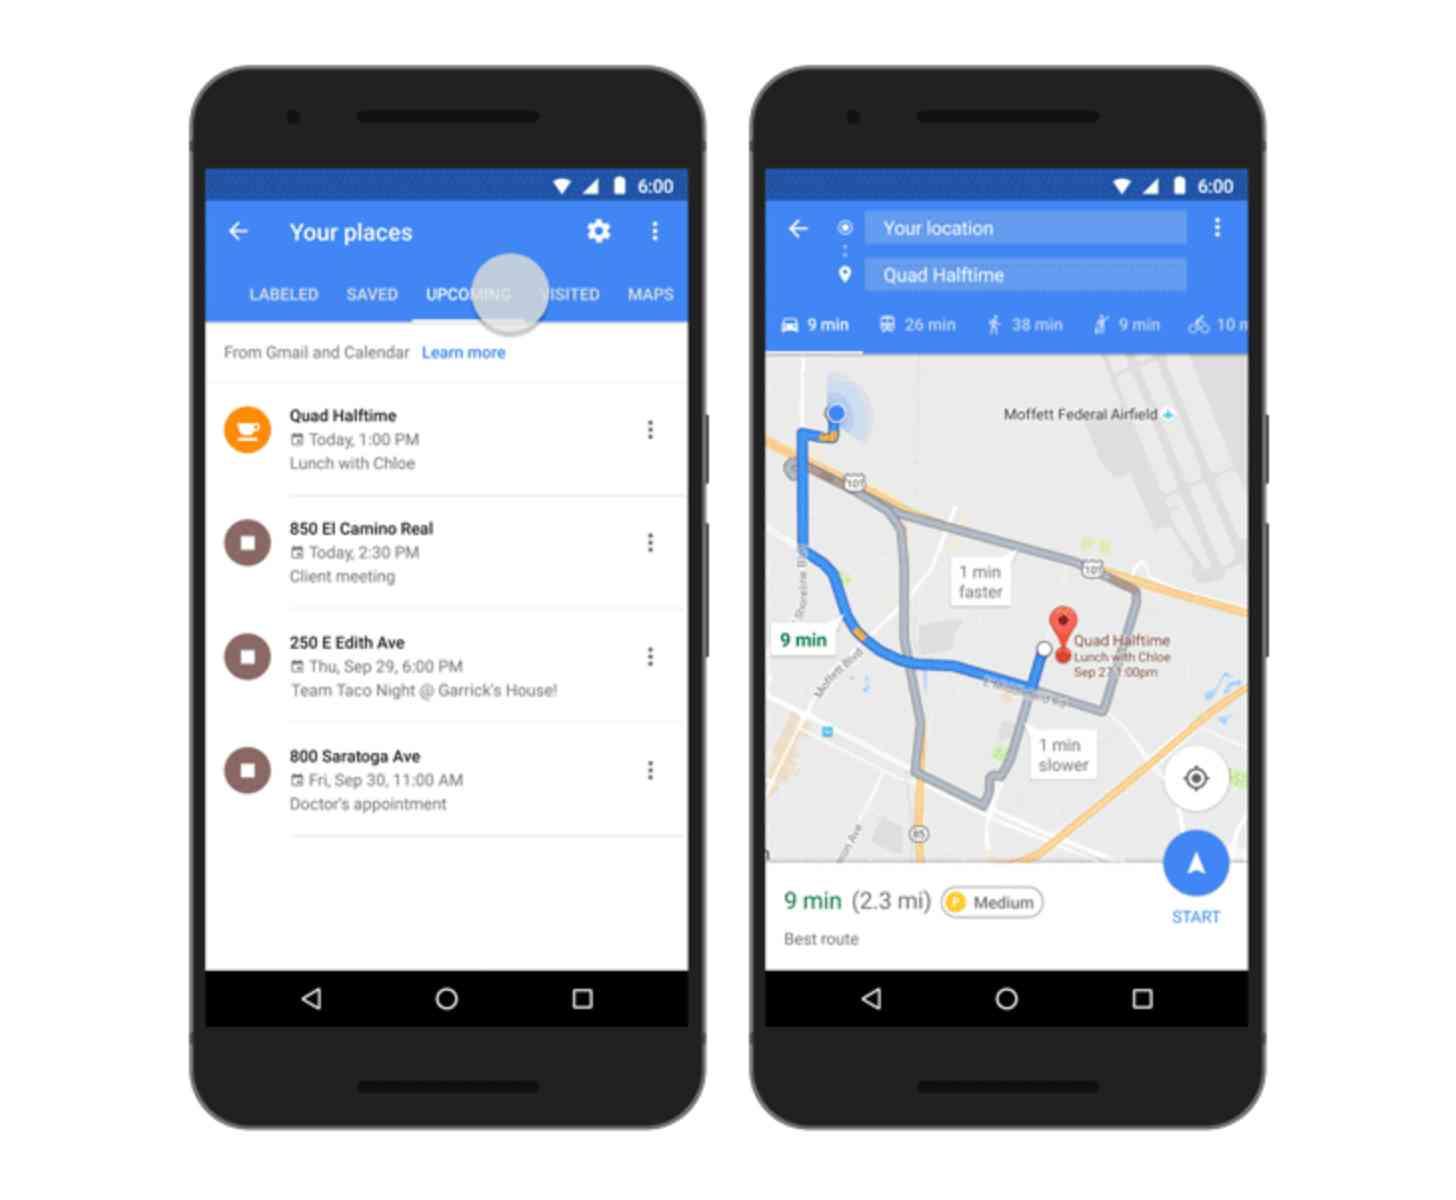 google maps calendar integration. google maps now integrates with google calendar to help you